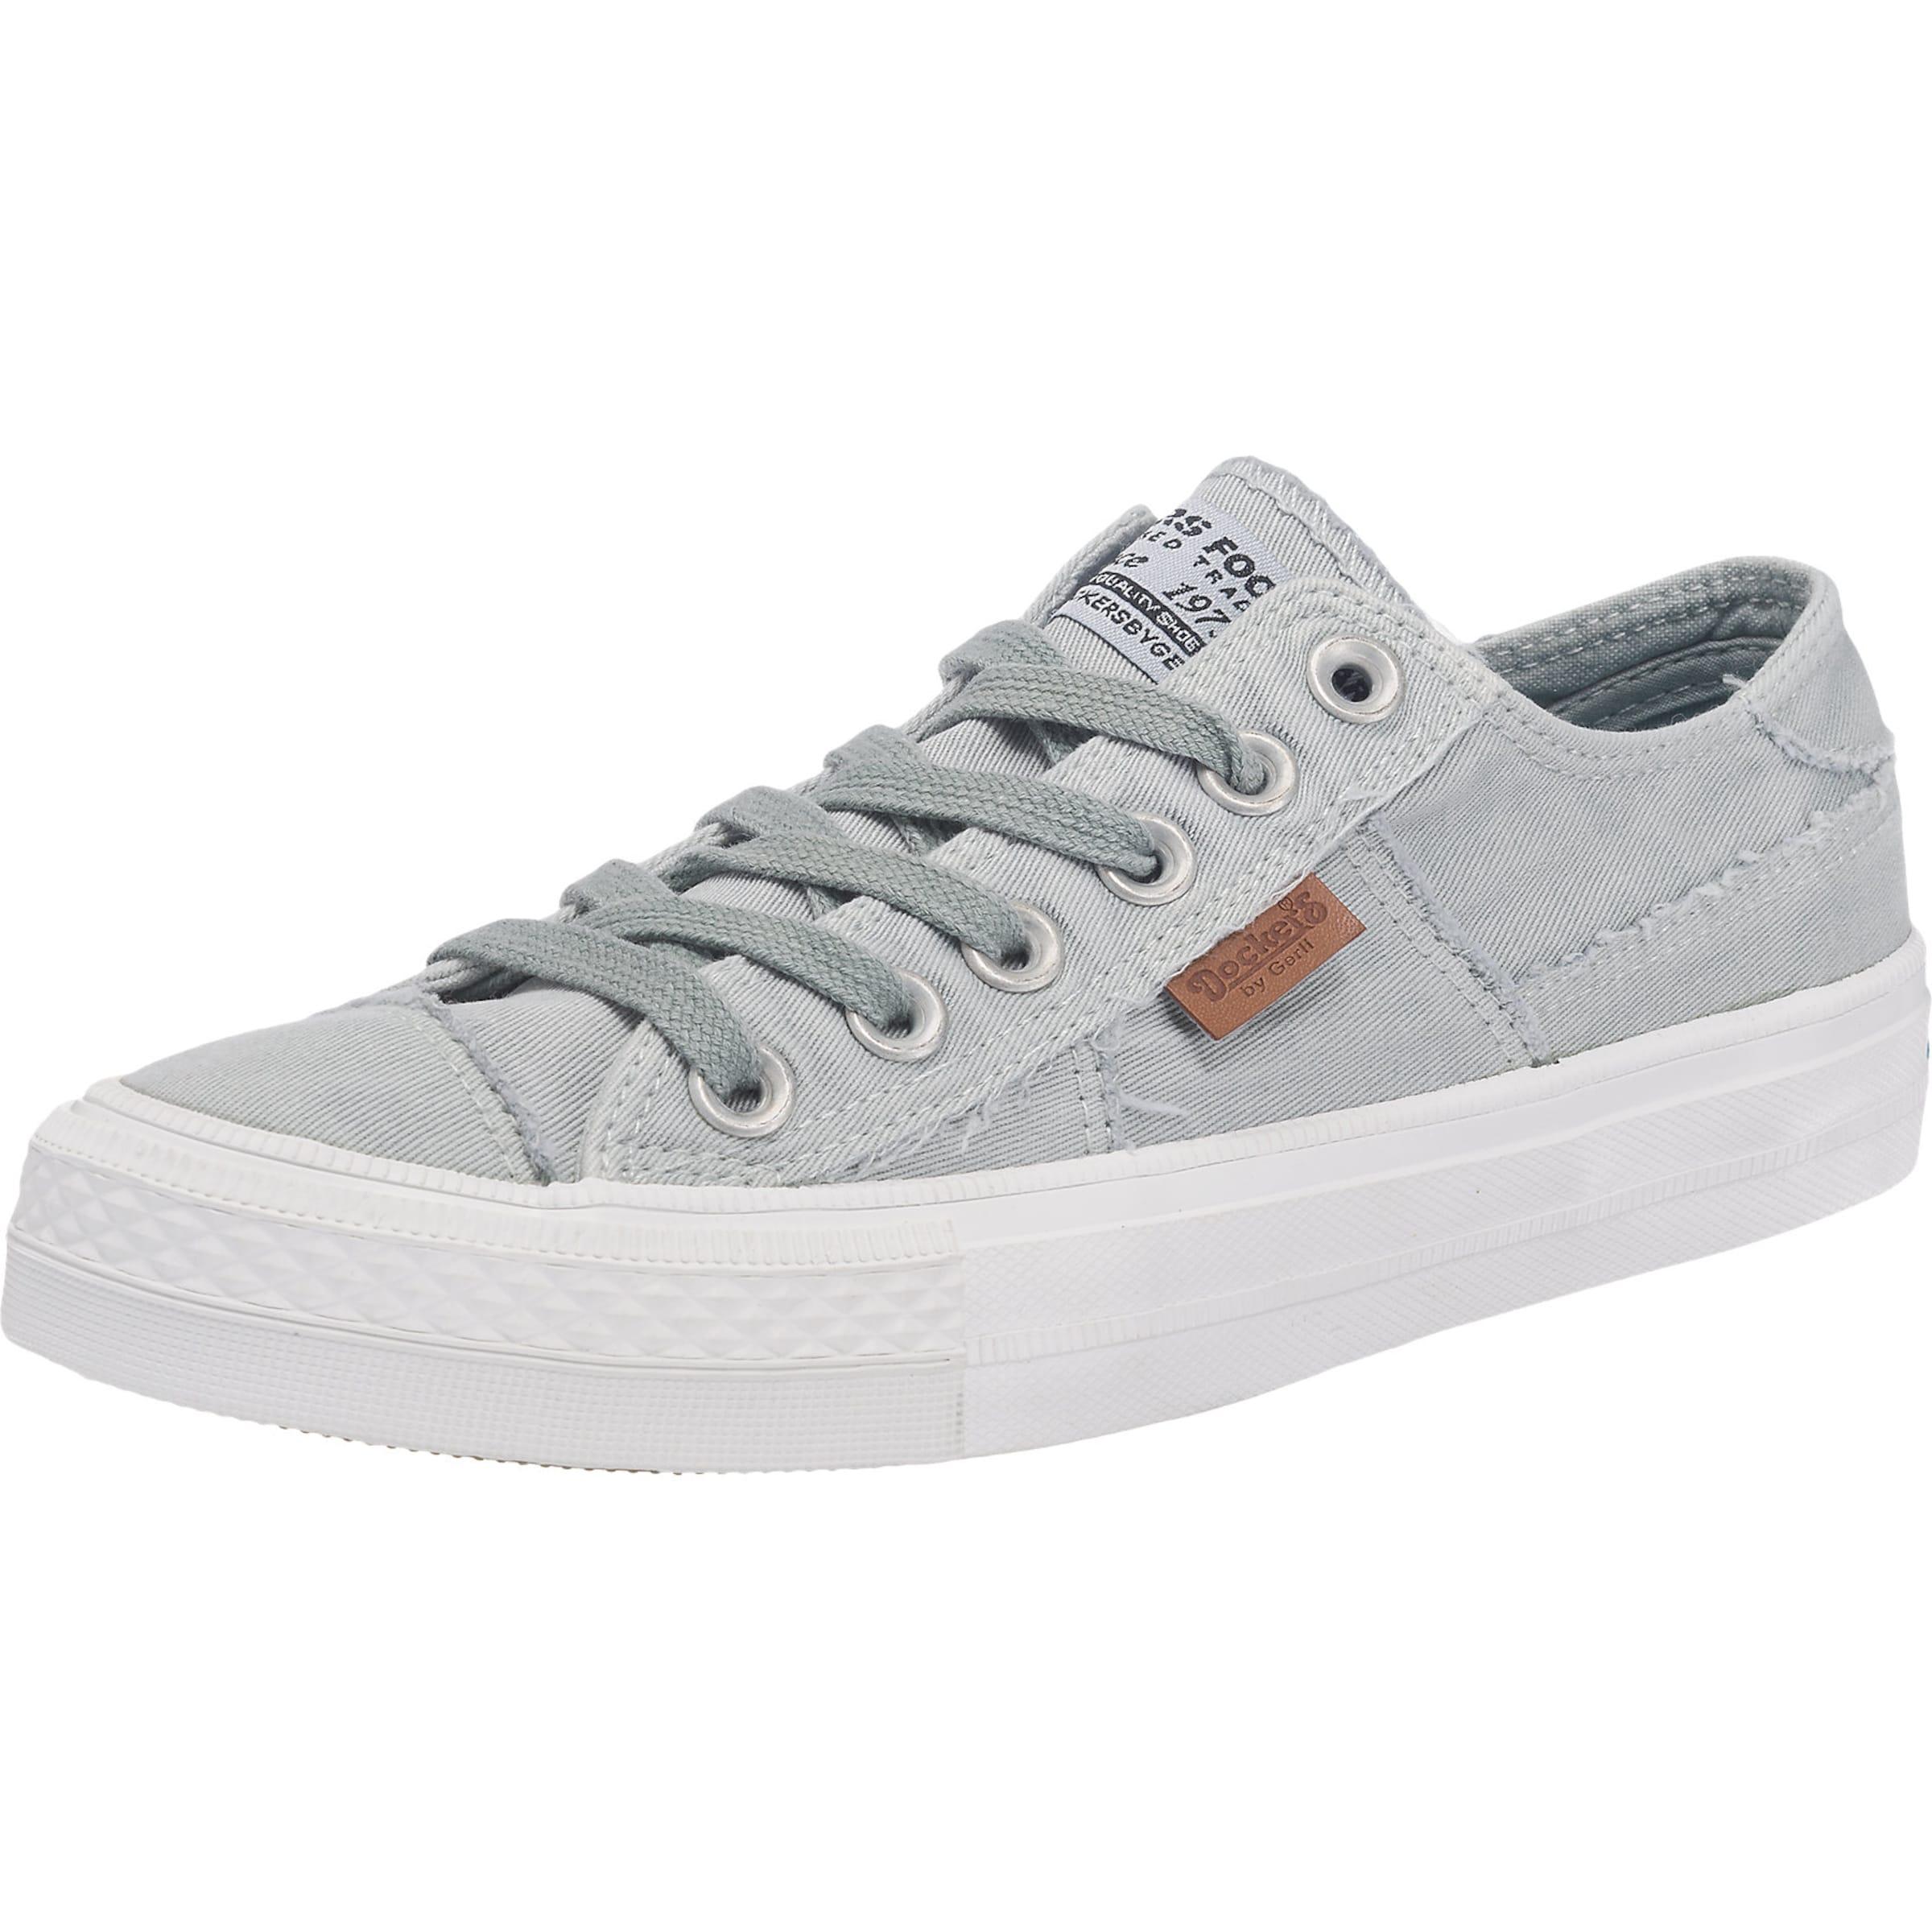 Dockers by Gerli Sneakers Verschleißfeste billige Schuhe